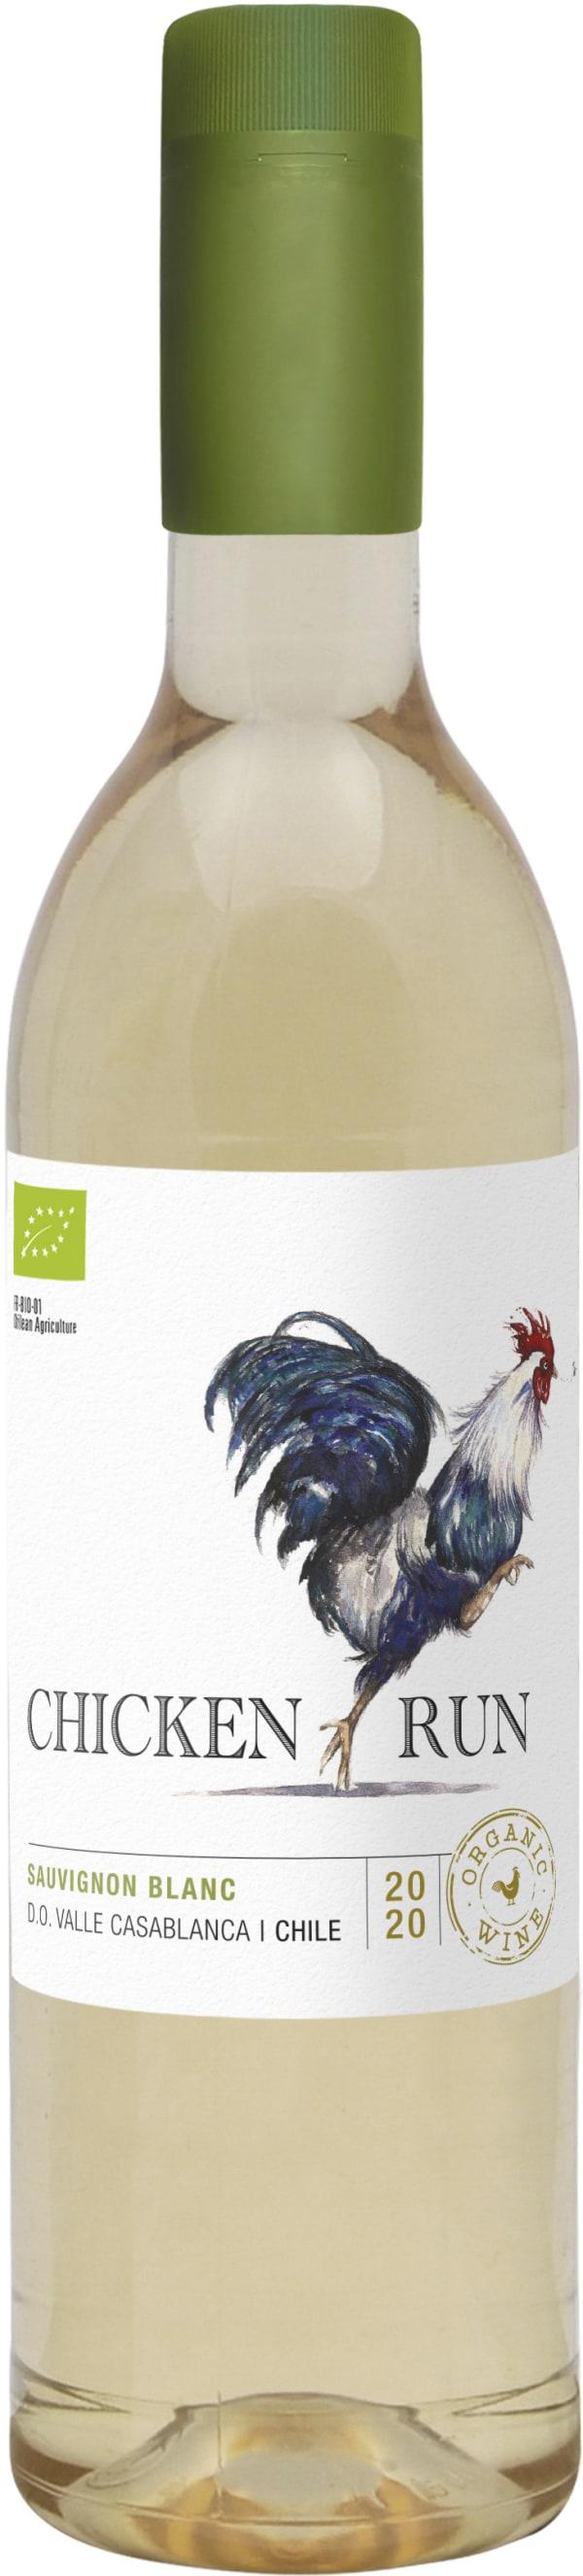 Chicken Run Sauvignon Blanc Organic 2020 plastic bottle